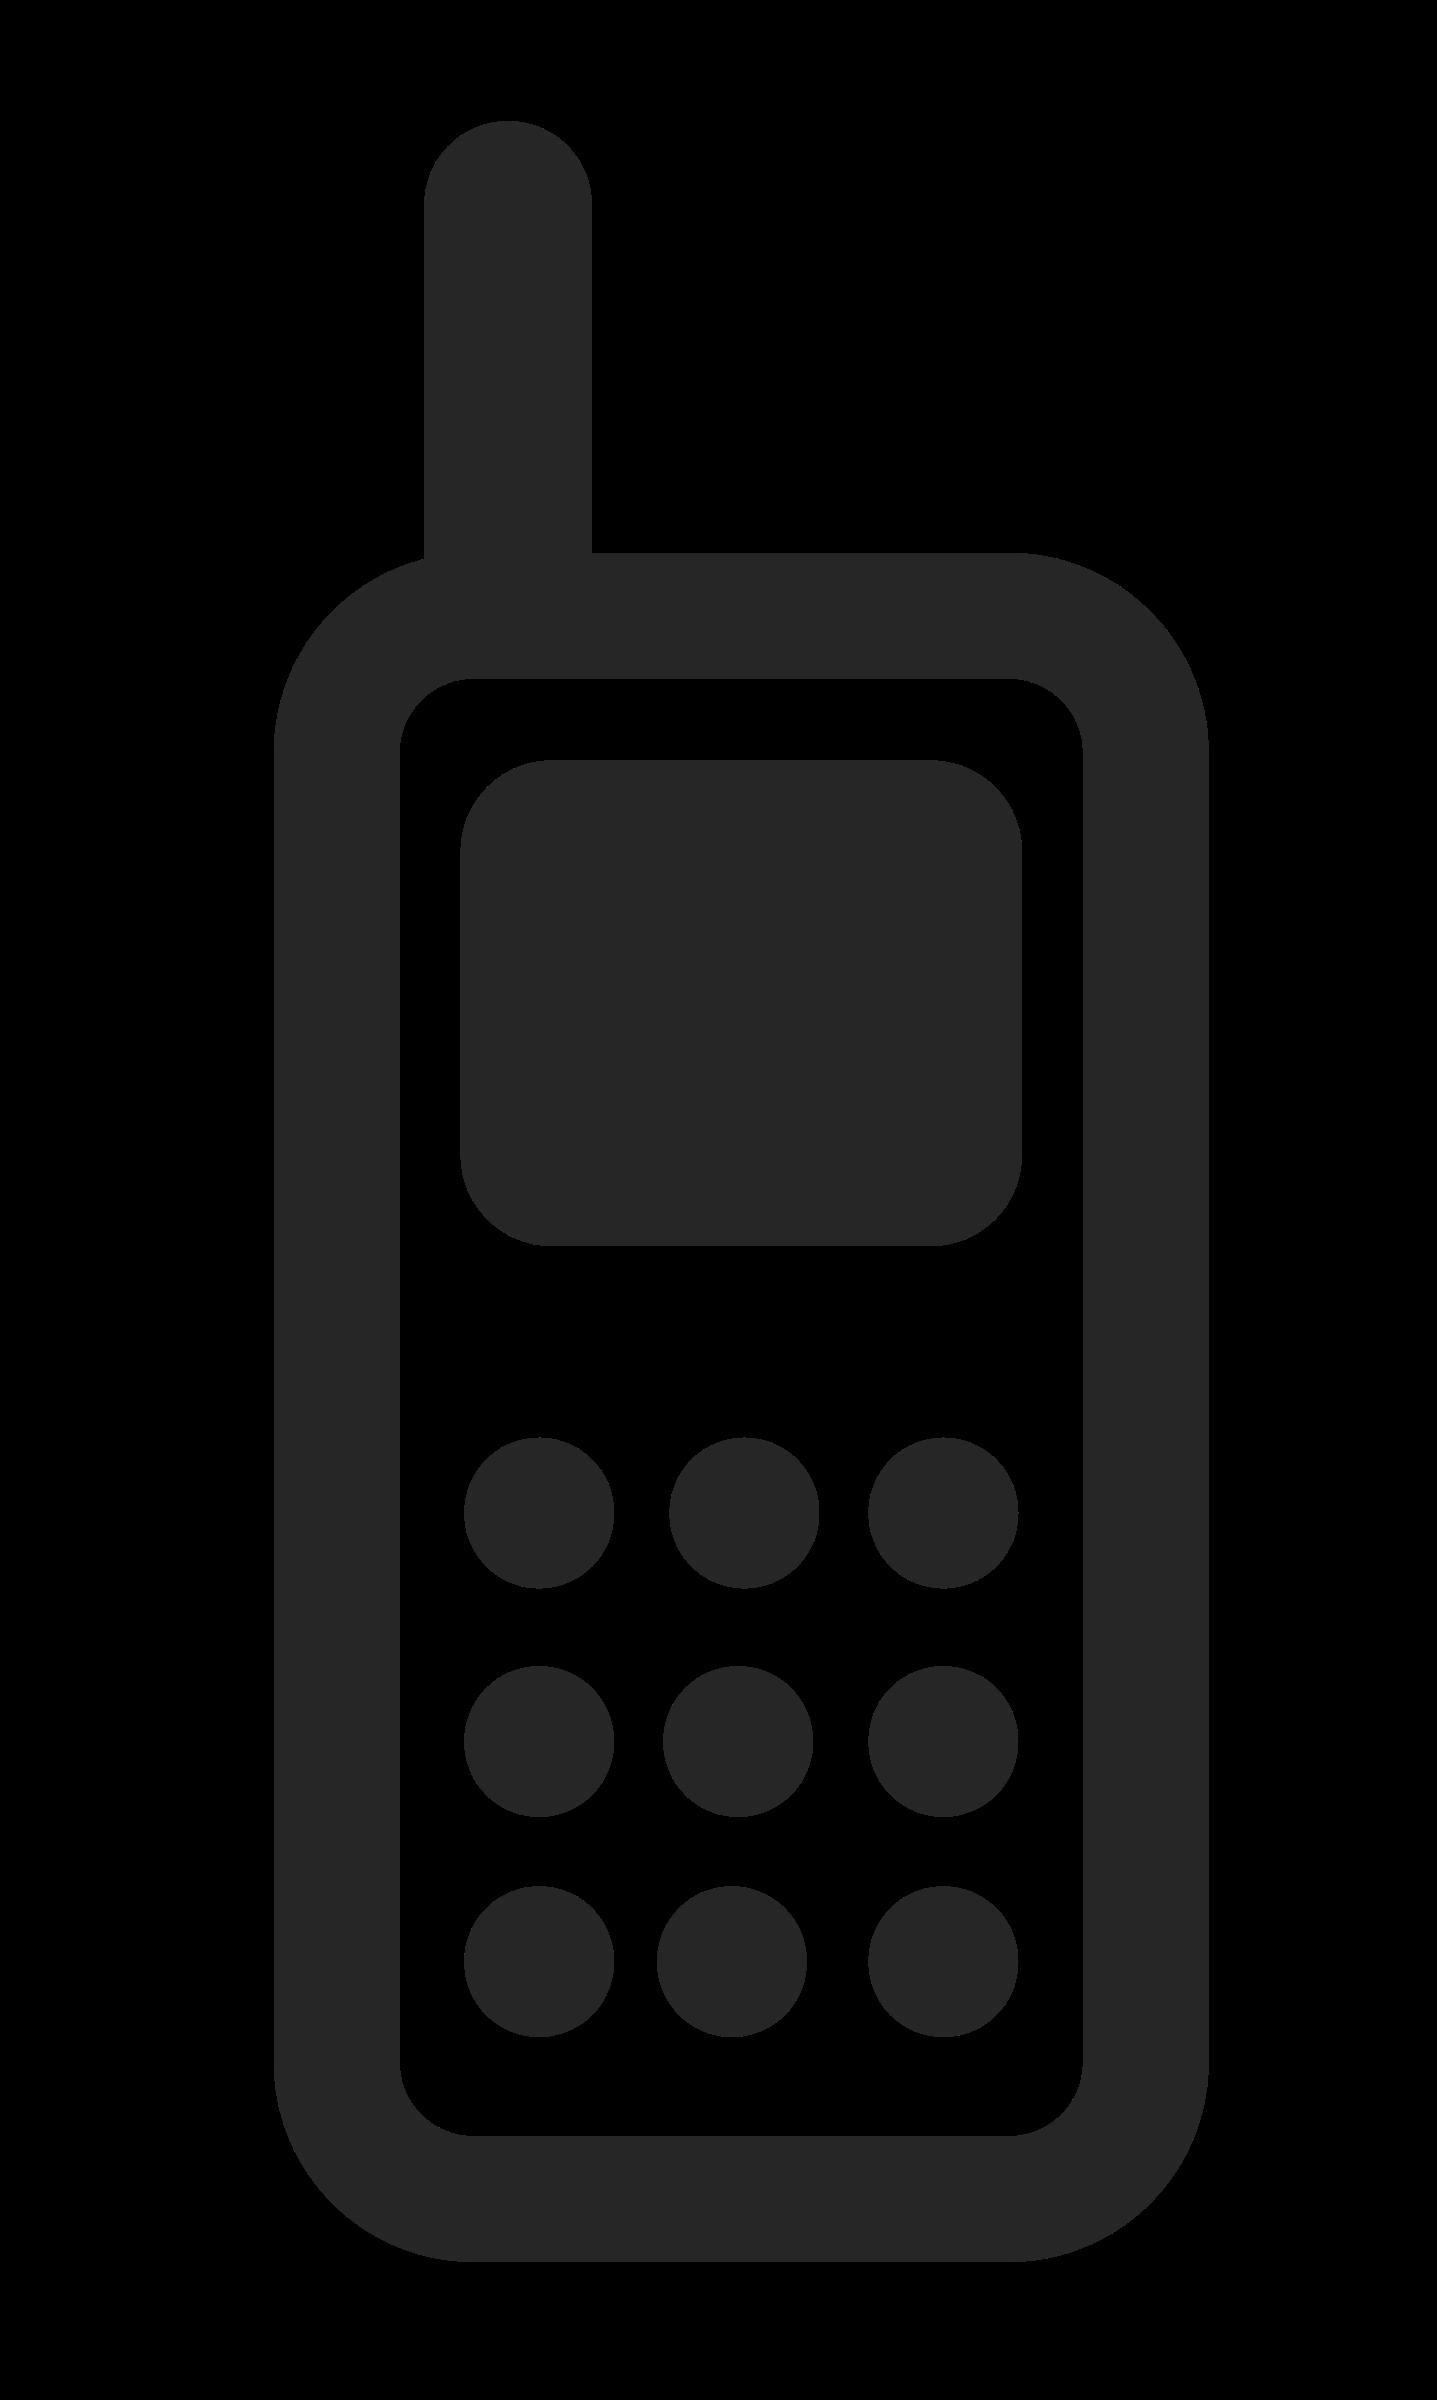 Free Phone Icon Cliparts, Download Free Clip Art, Free Clip.